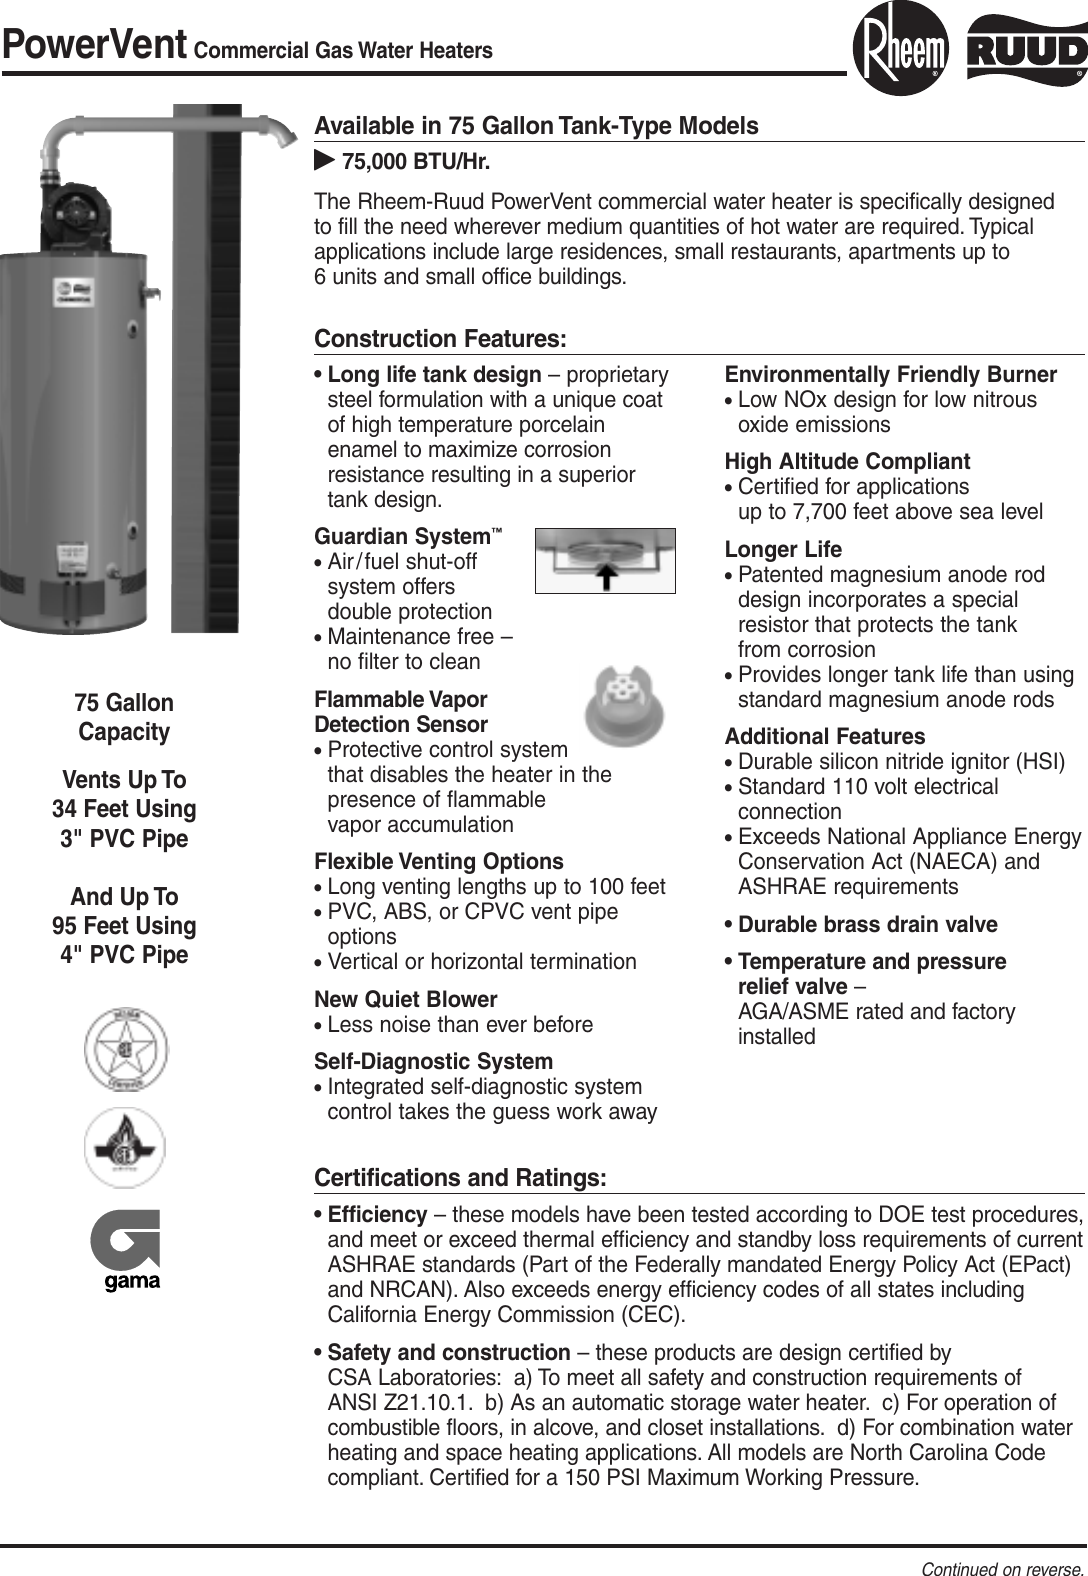 Rheem Water Heater Manual Water Ionizer